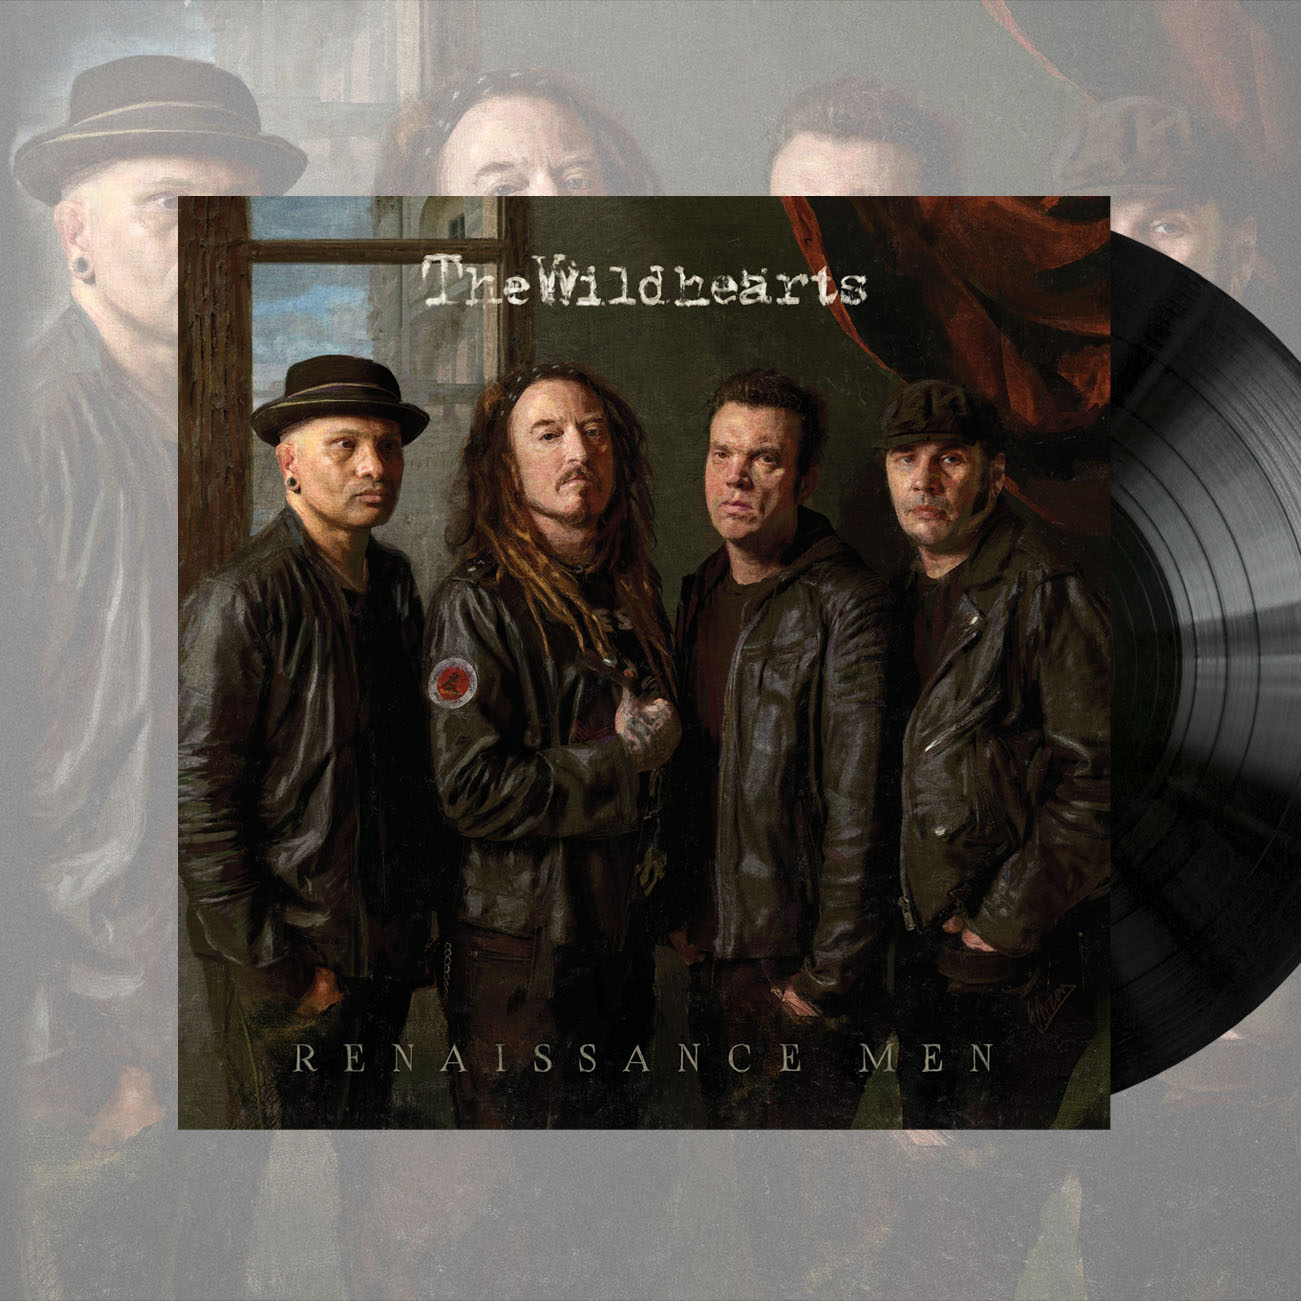 The Wildhearts - 'Renaissance Men' Black Vinyl - The Wildhearts